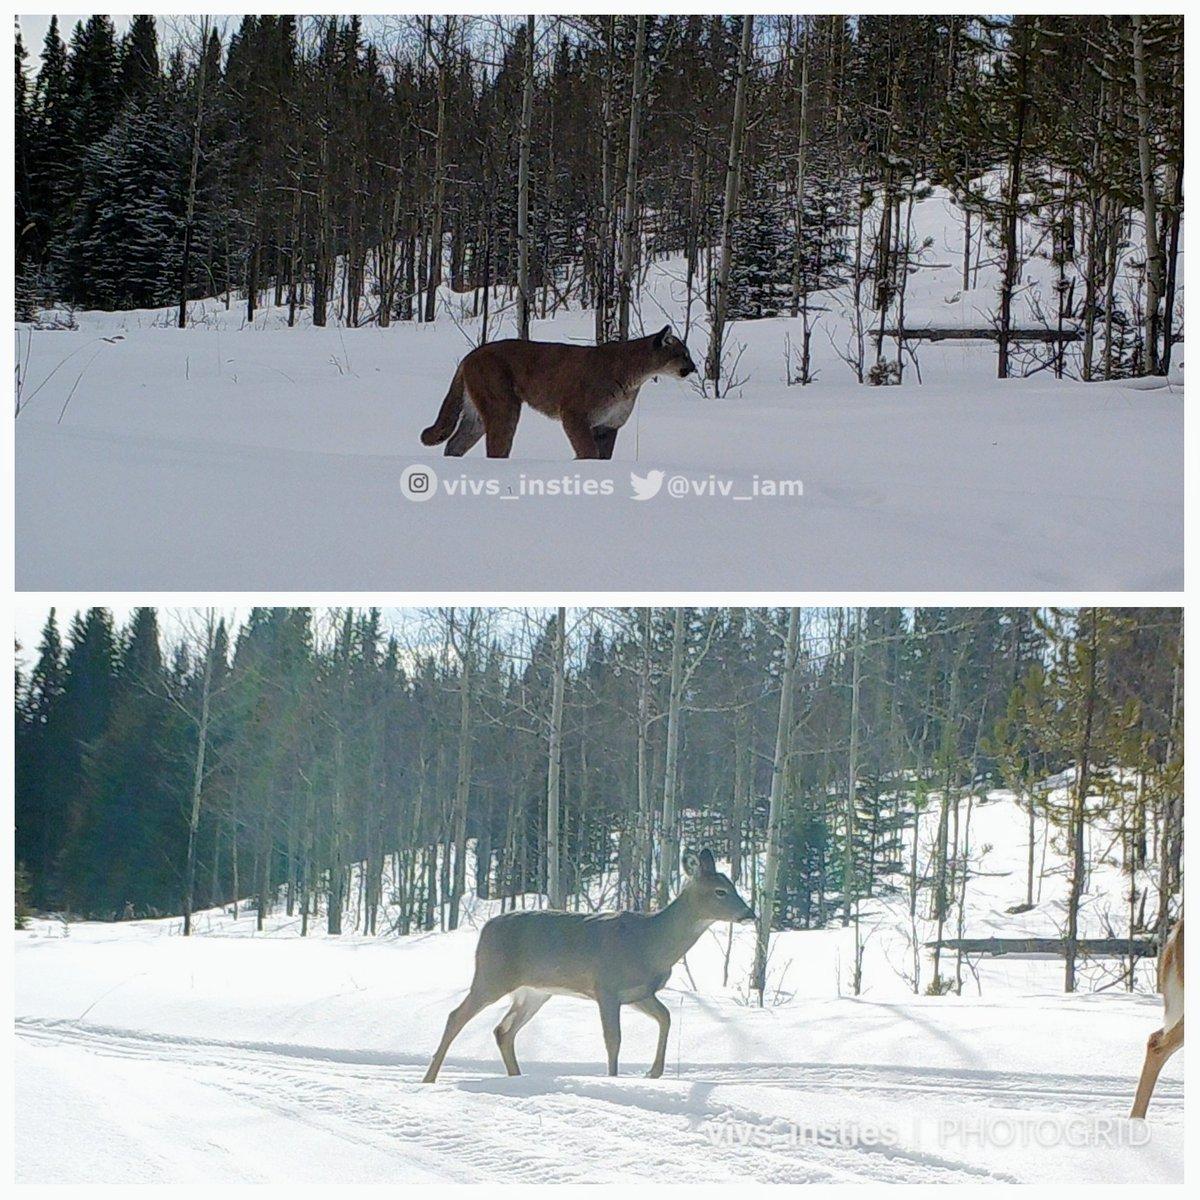 Good size comparison between predator and prey right here. #cougar #whitetaileddeer #wildlife #naturelovers